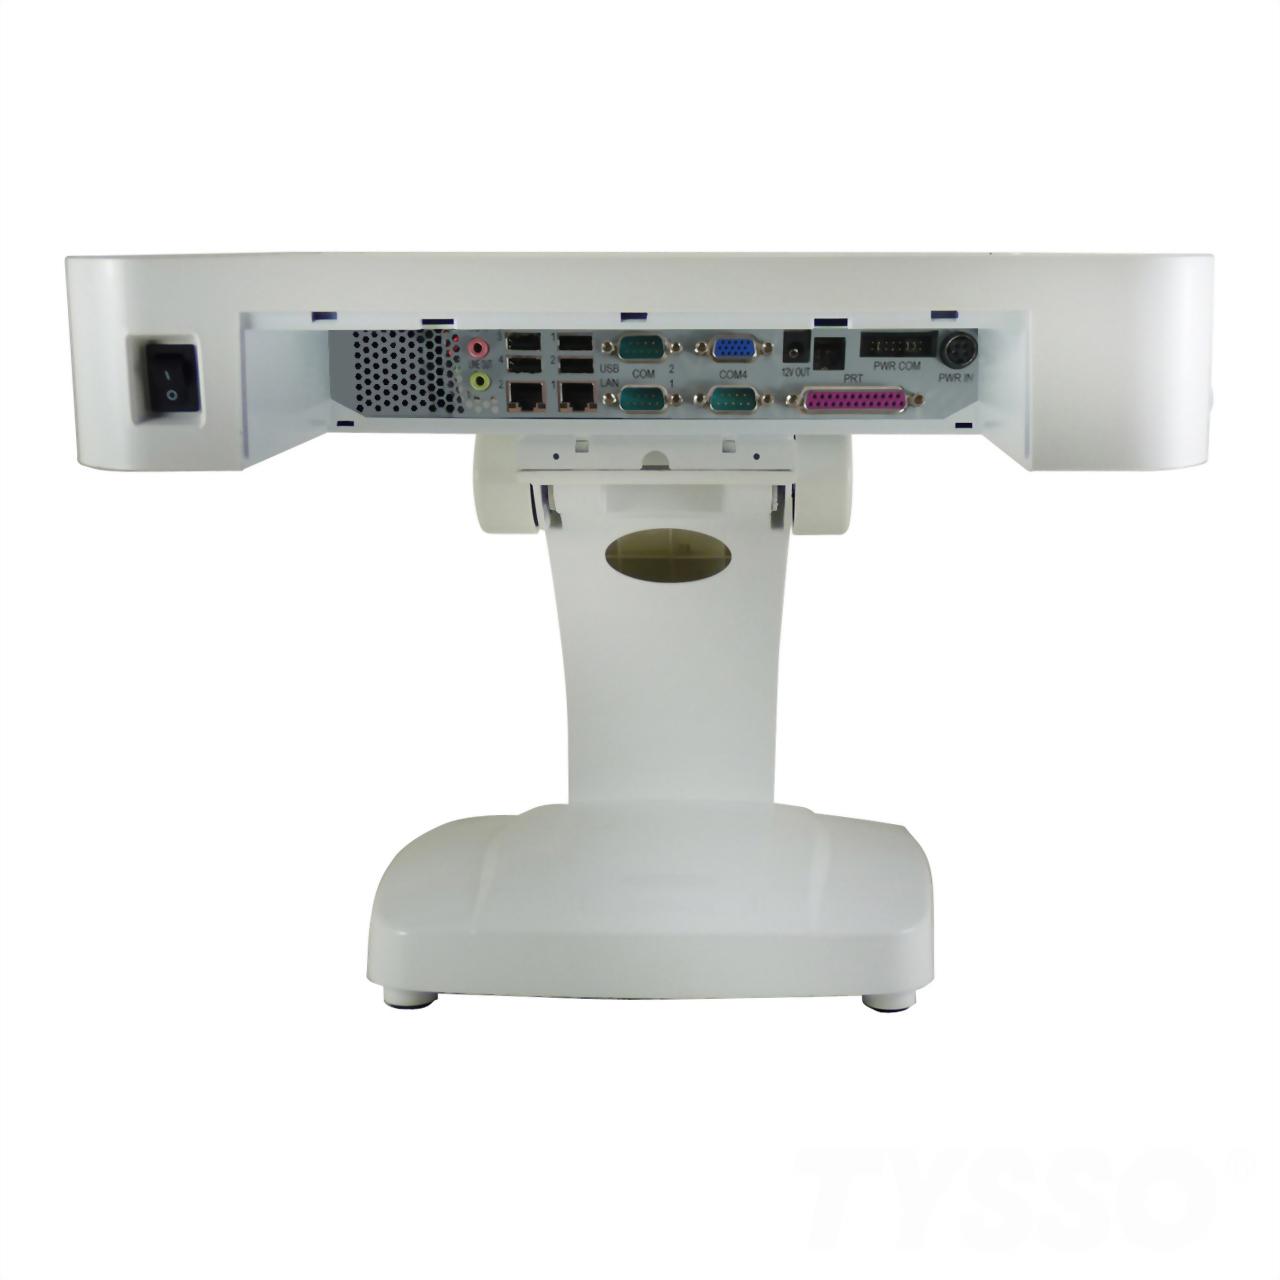 POS Systems POS-9000-i